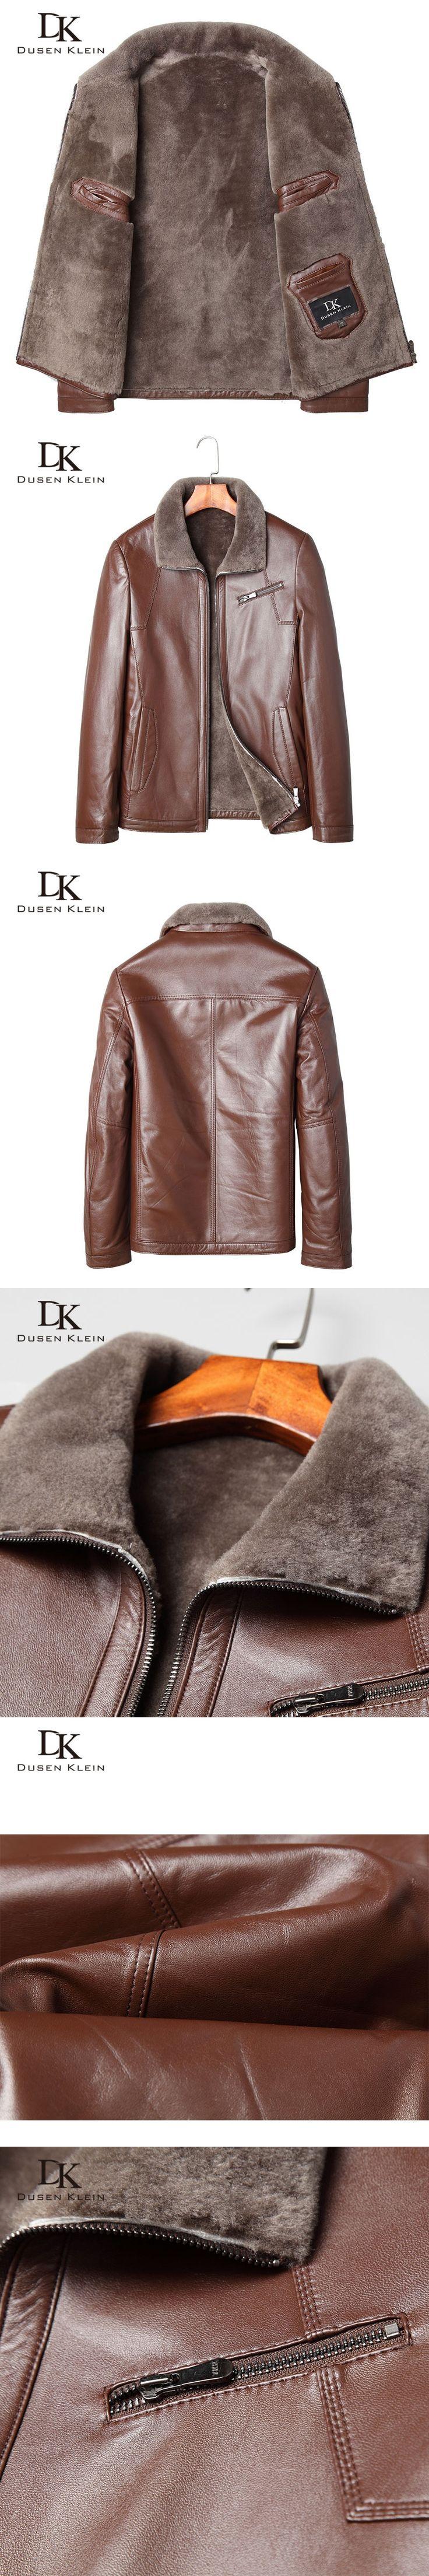 Brand Winter leather jacket wool coats mens Genuine sheepskin Dusen Klein New 2017 Brown Luxury wool leather clothing  71A1588